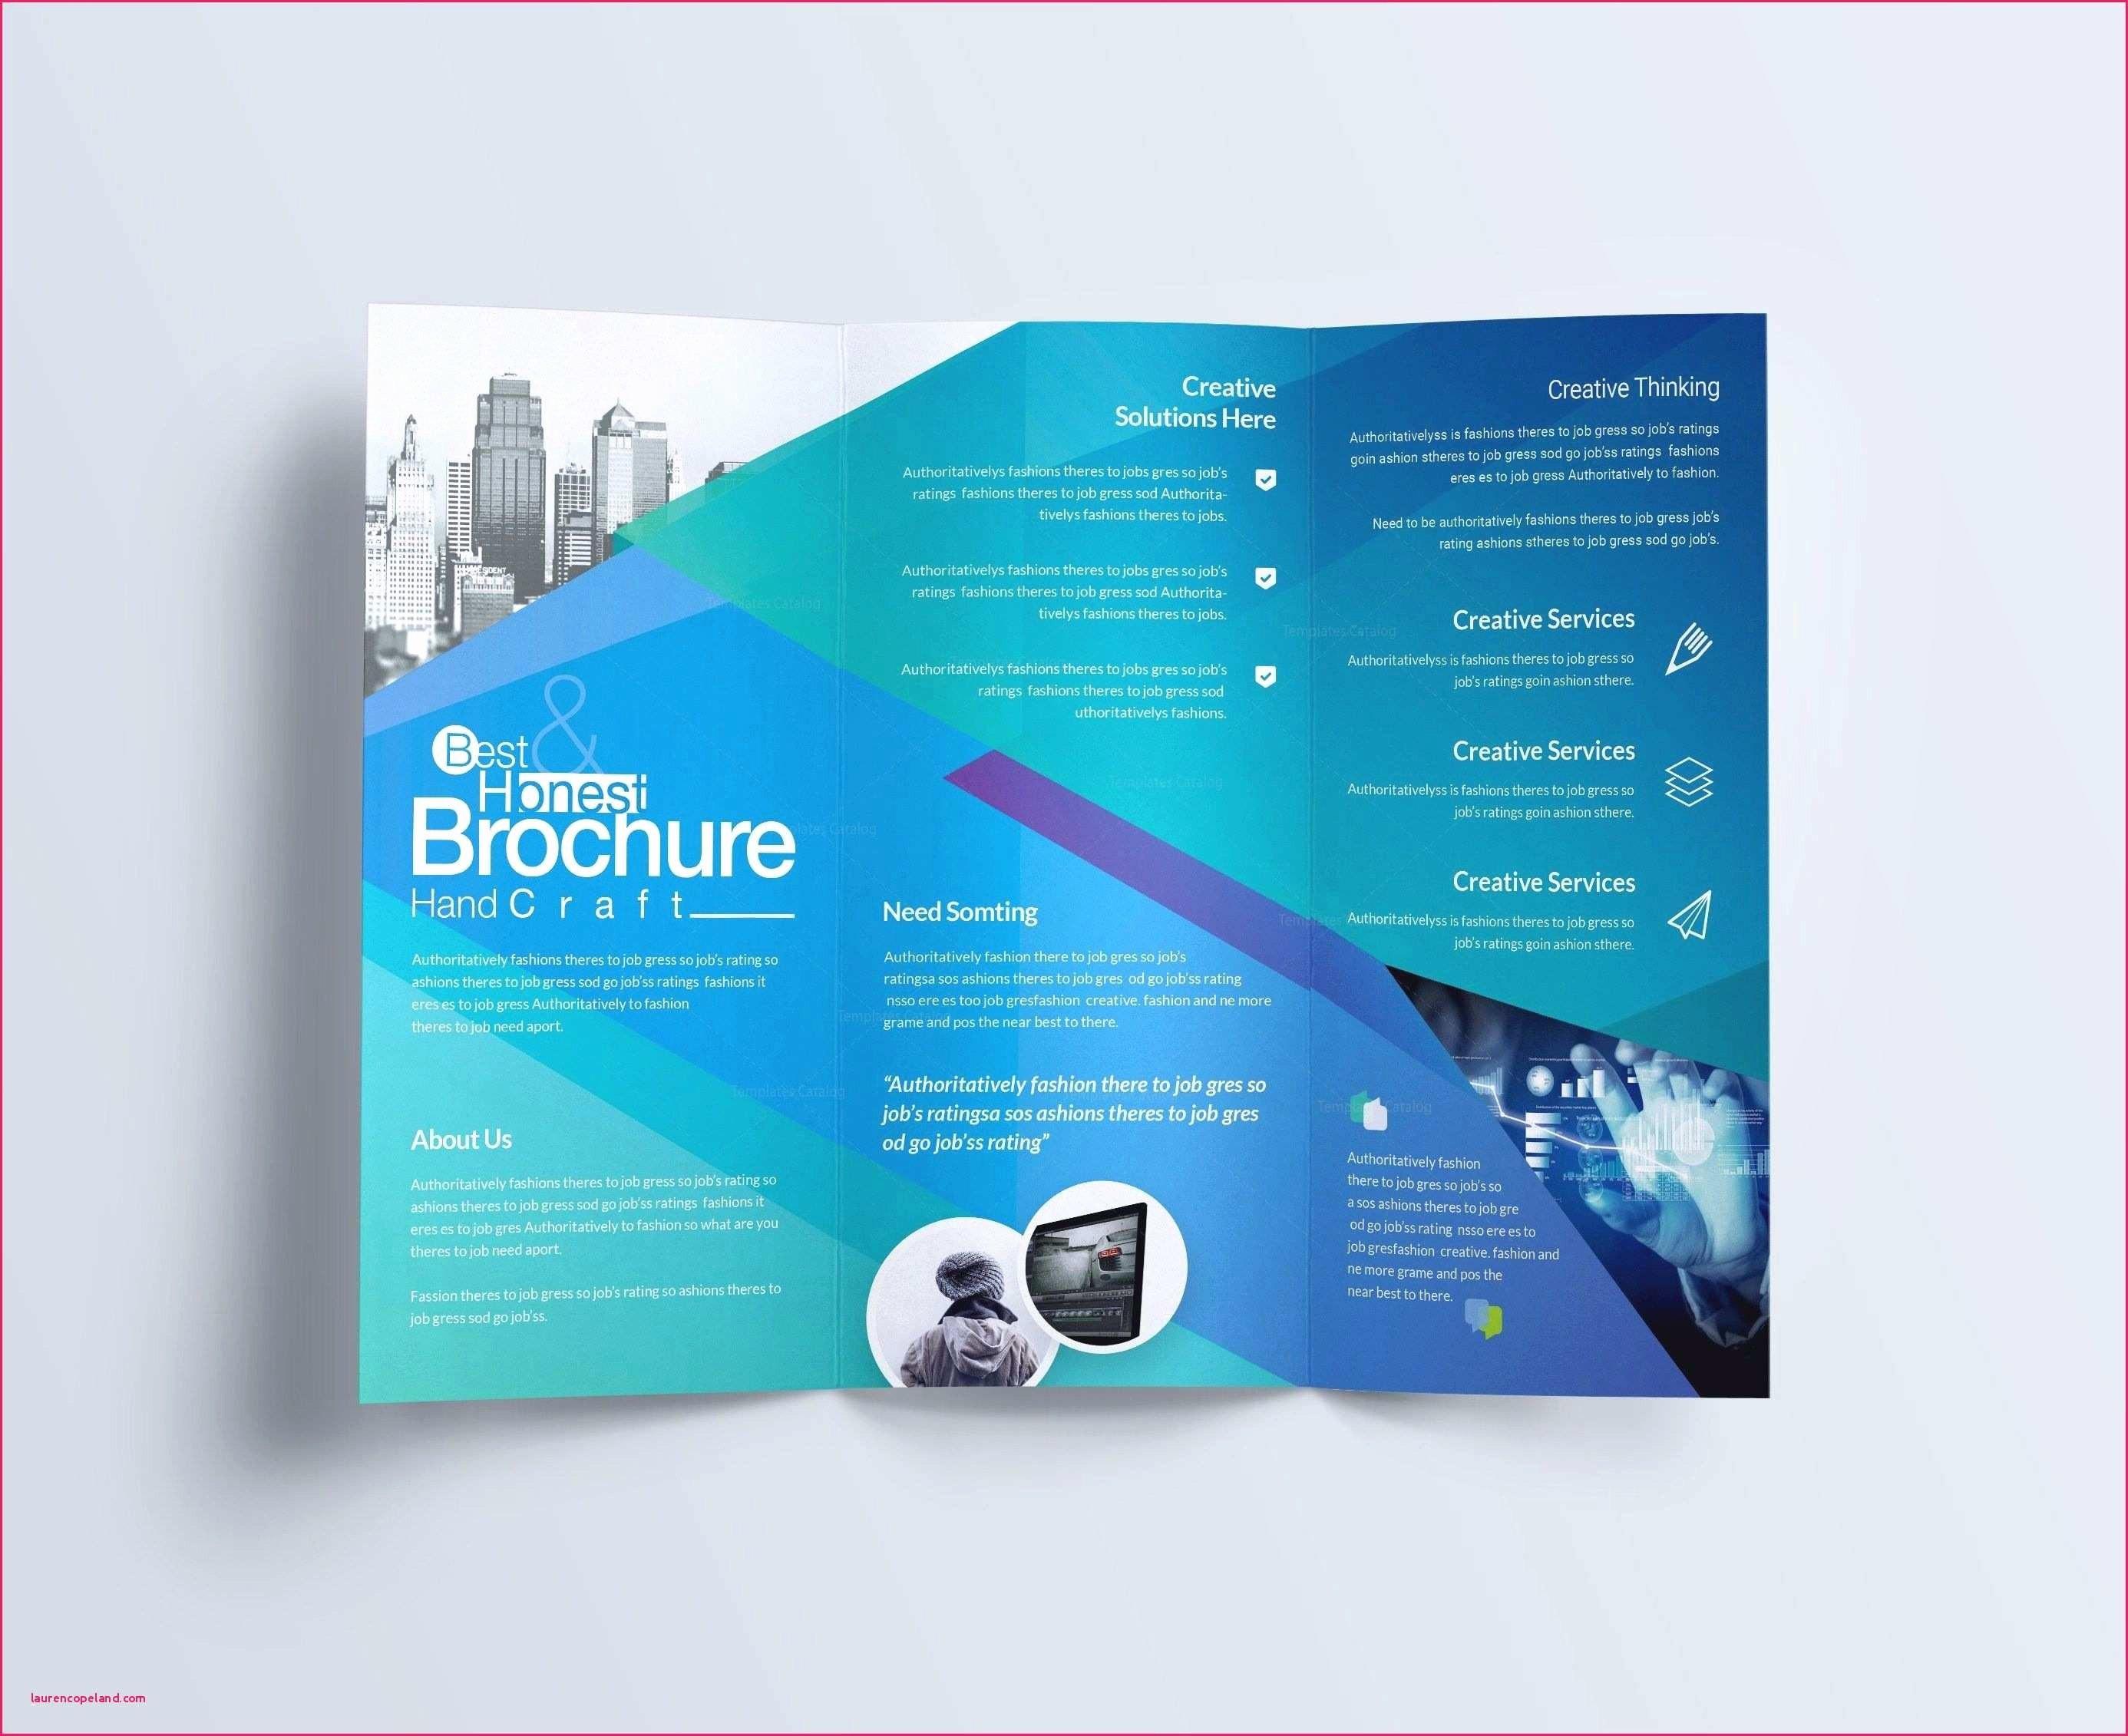 Brochure Templates Free Download For Word Microsoft Brochure Für Regarding Architecture Brochure Templates Free Download